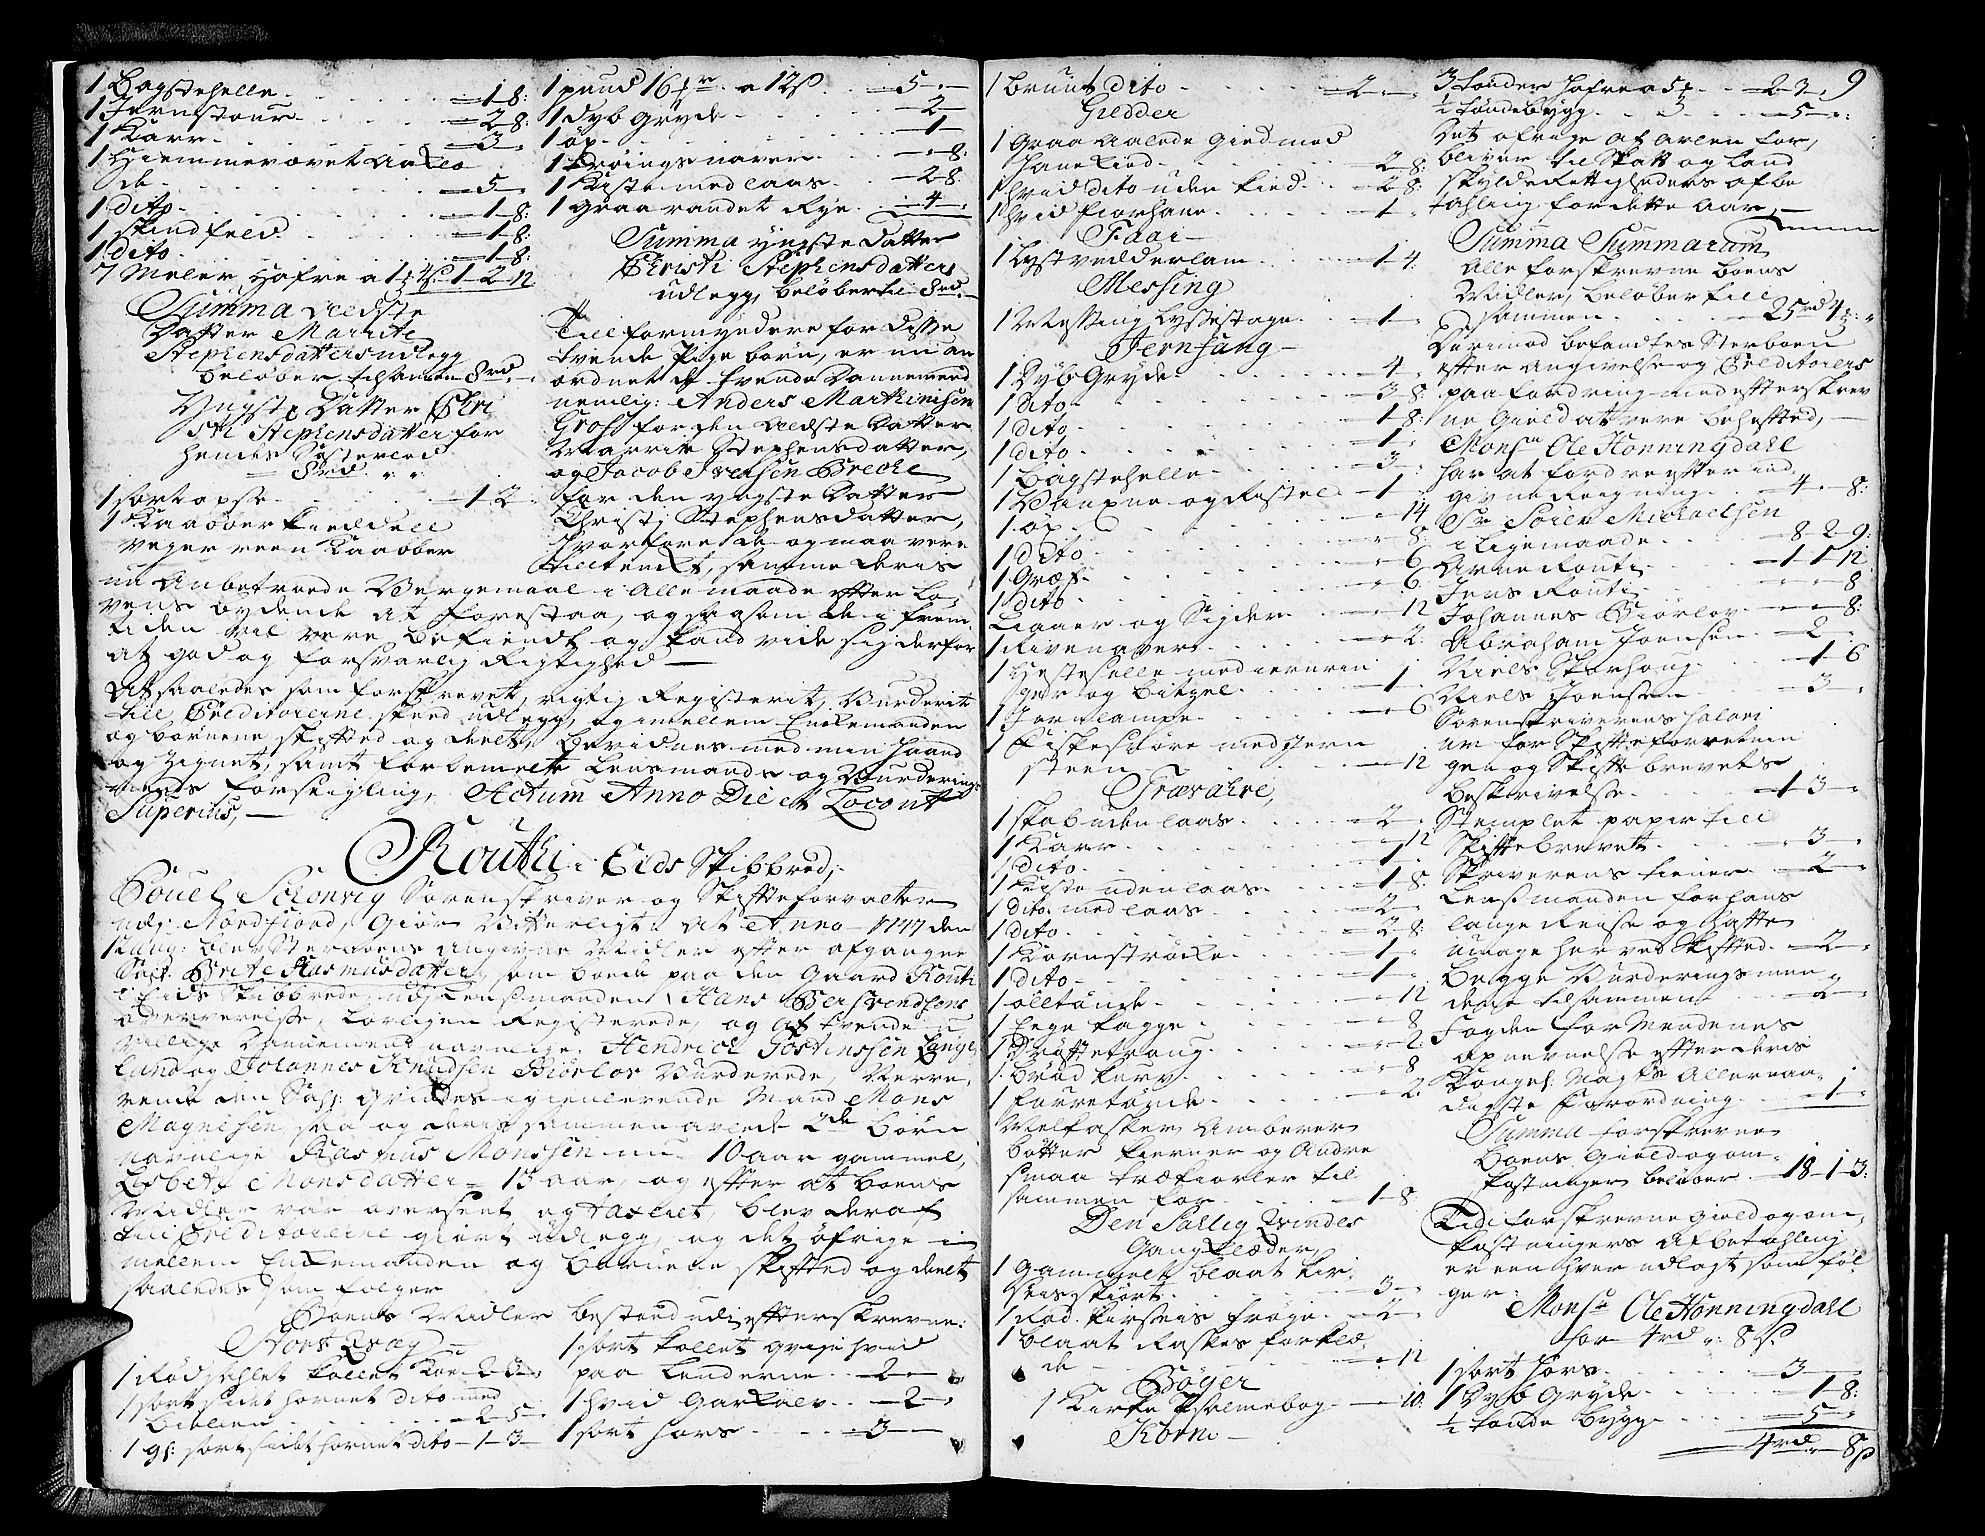 SAB, Nordfjord Sorenskriveri, 04/04a/L0010: Skifteprotokollar, 1747-1750, s. 8b-9a